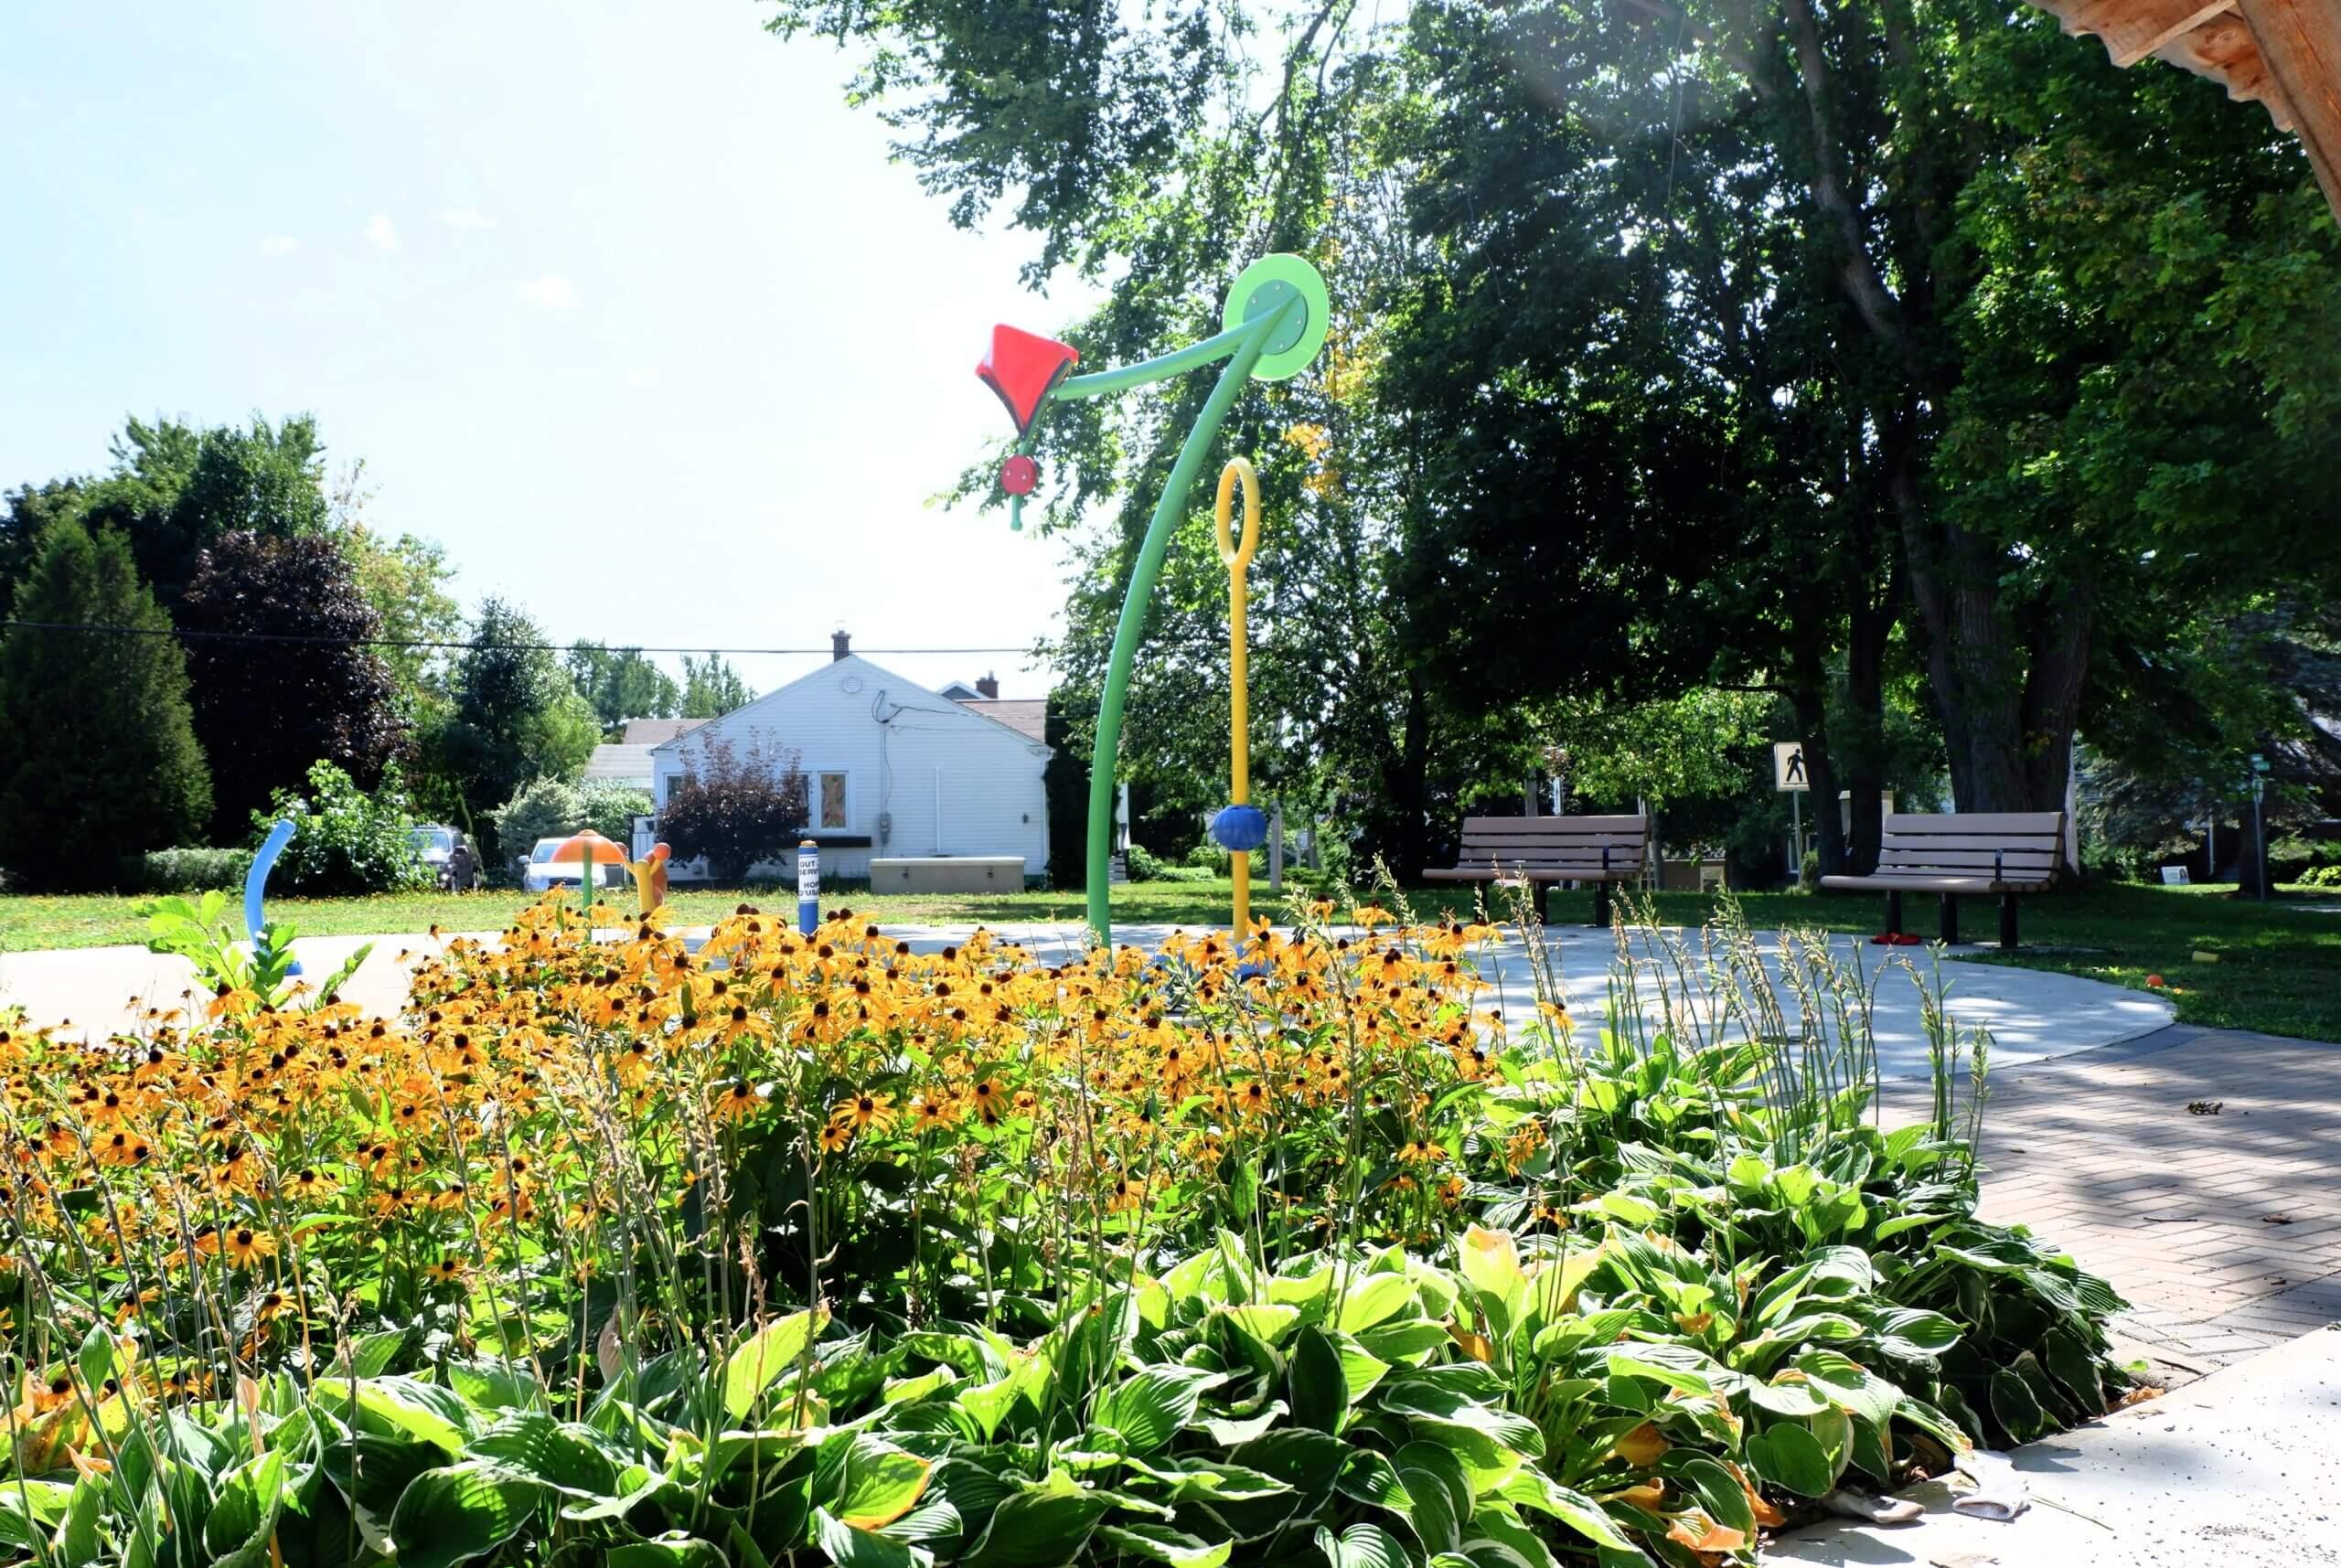 Braemar Park Centre Street Playground Moncton Pickle Planet splash feature shade